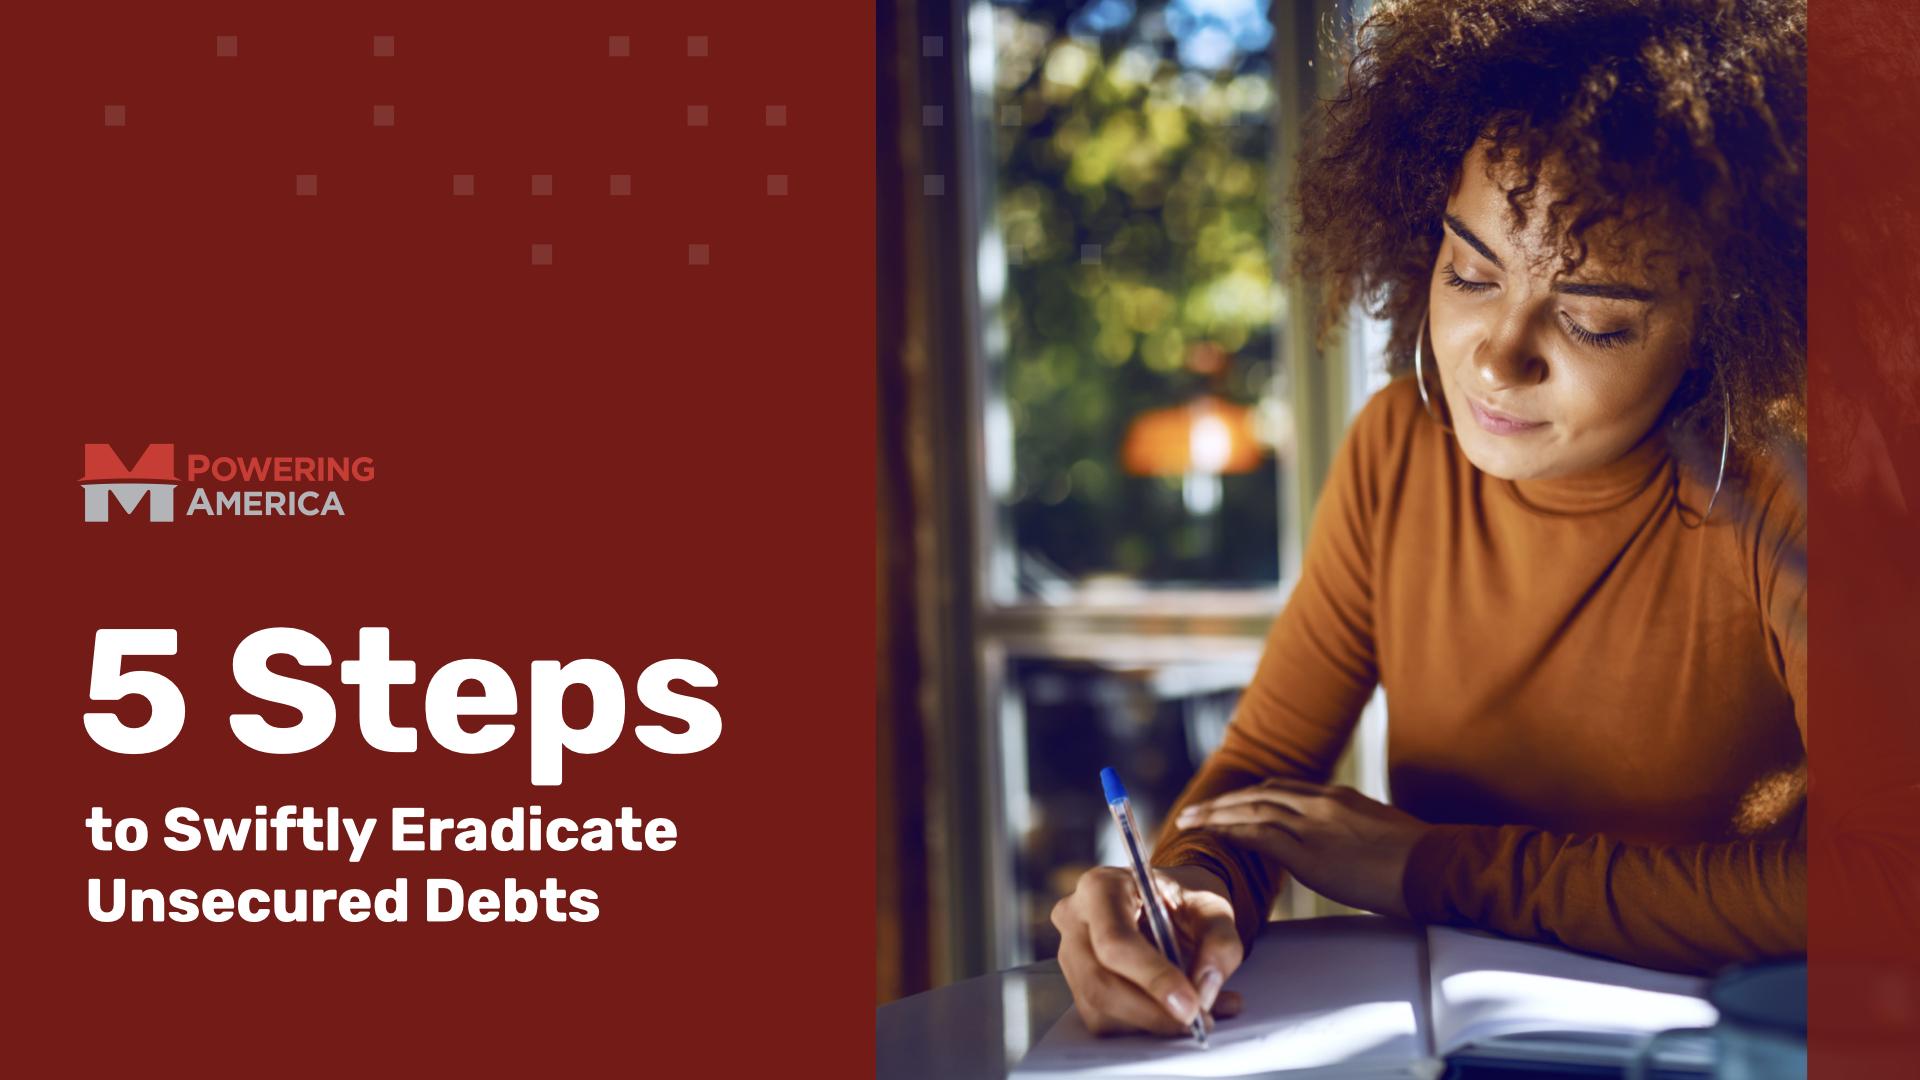 5 Steps to Swiftly Eradicate Unsecured Debts